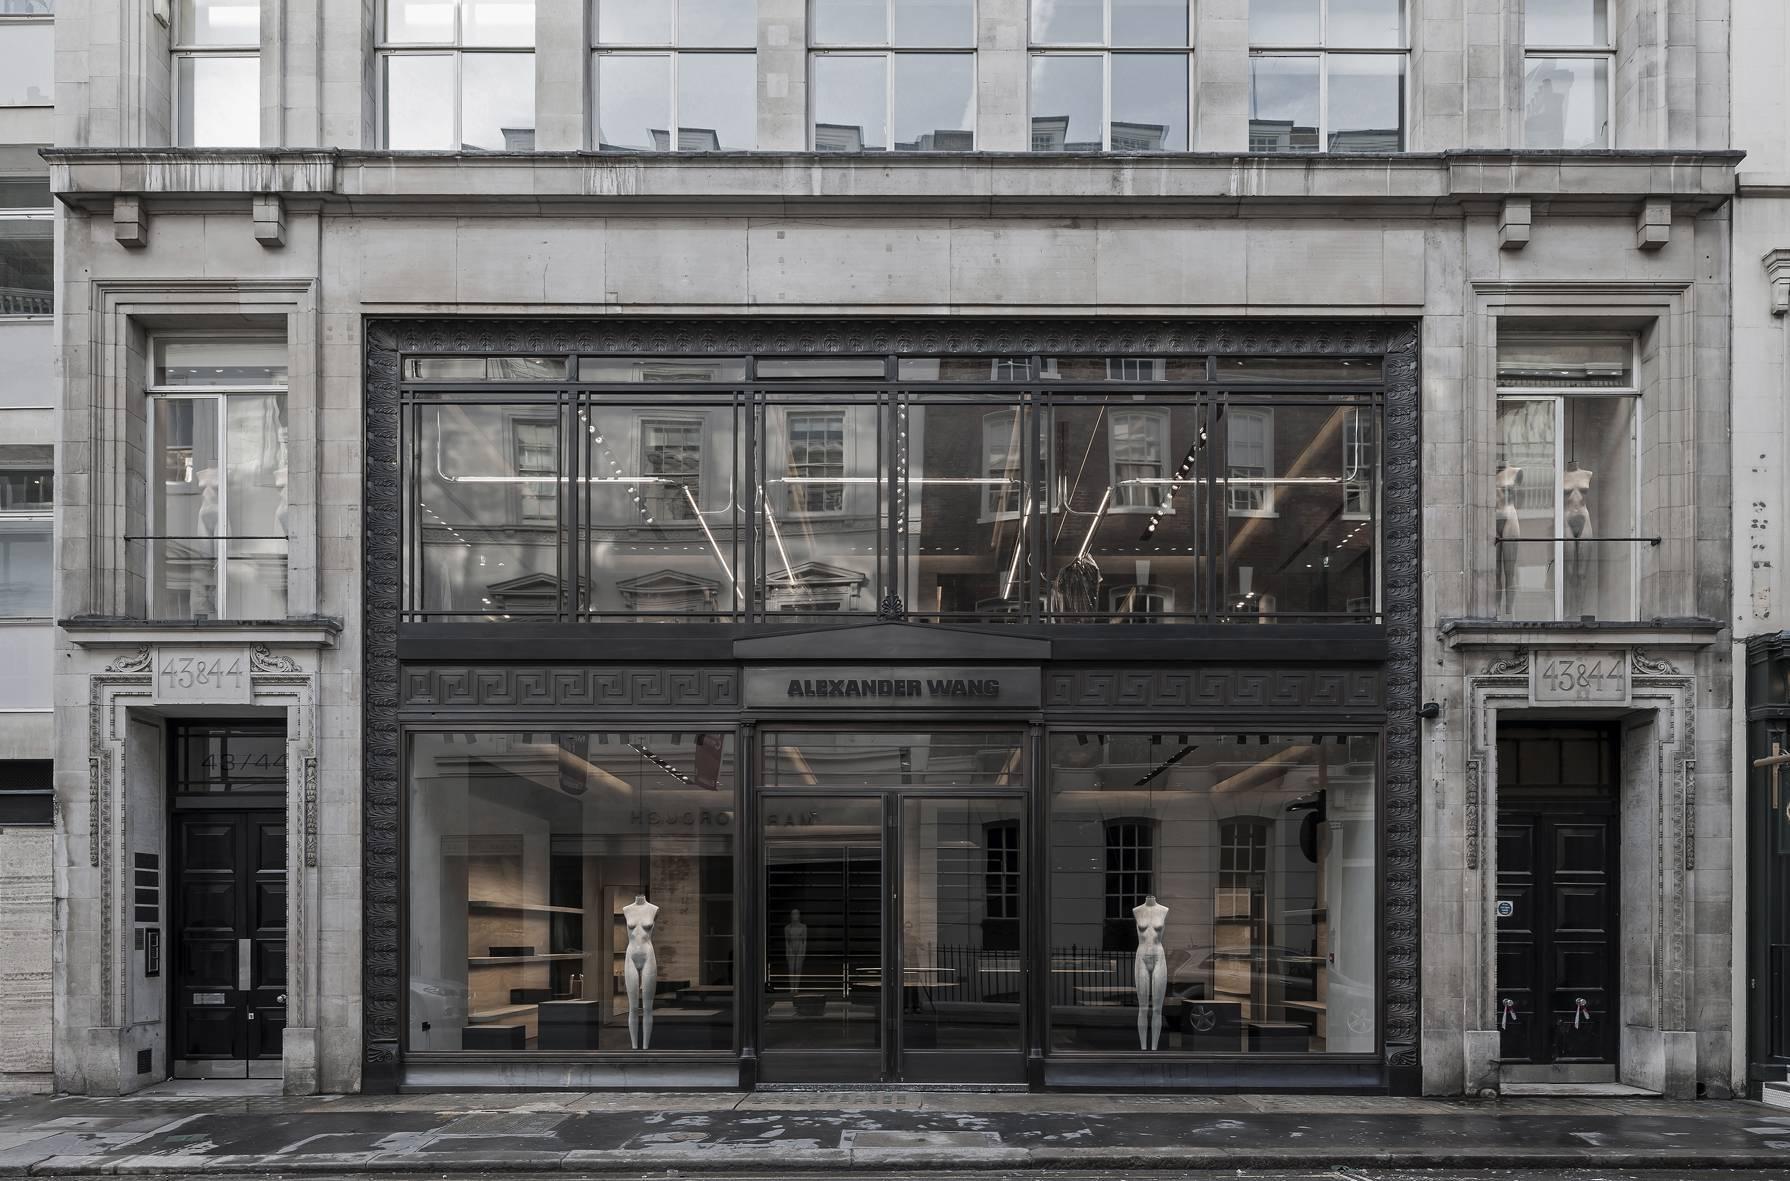 VVDA_Alexander Wang Flagship Store_Vincent Van Duysen Architects_01.jpg